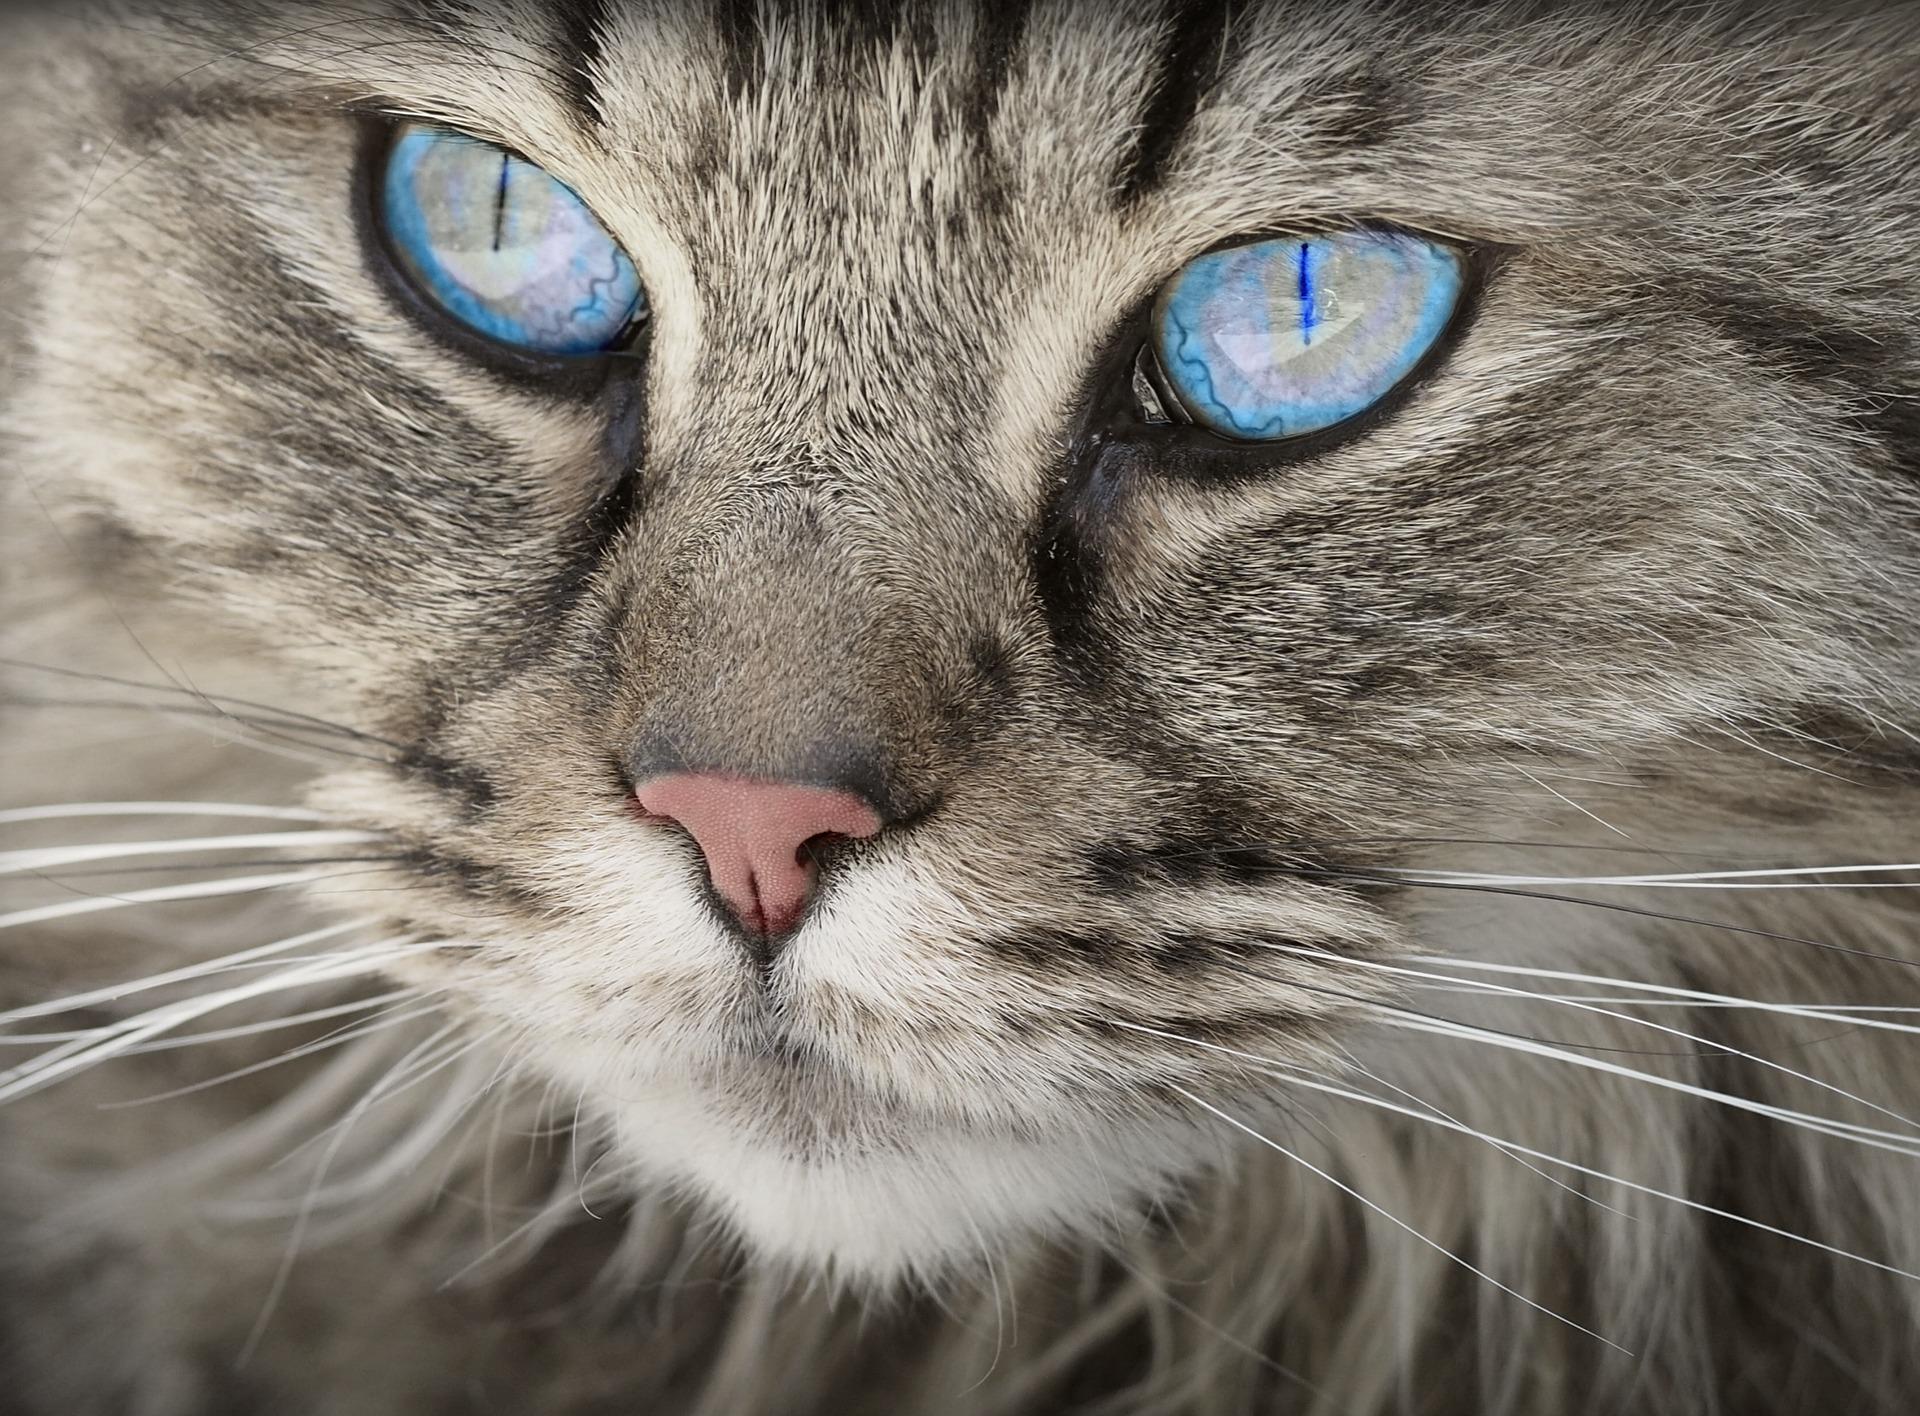 chat, félin, visage, yeux, Bleu, Animal de compagnie - Fonds d'écran HD - Professor-falken.com